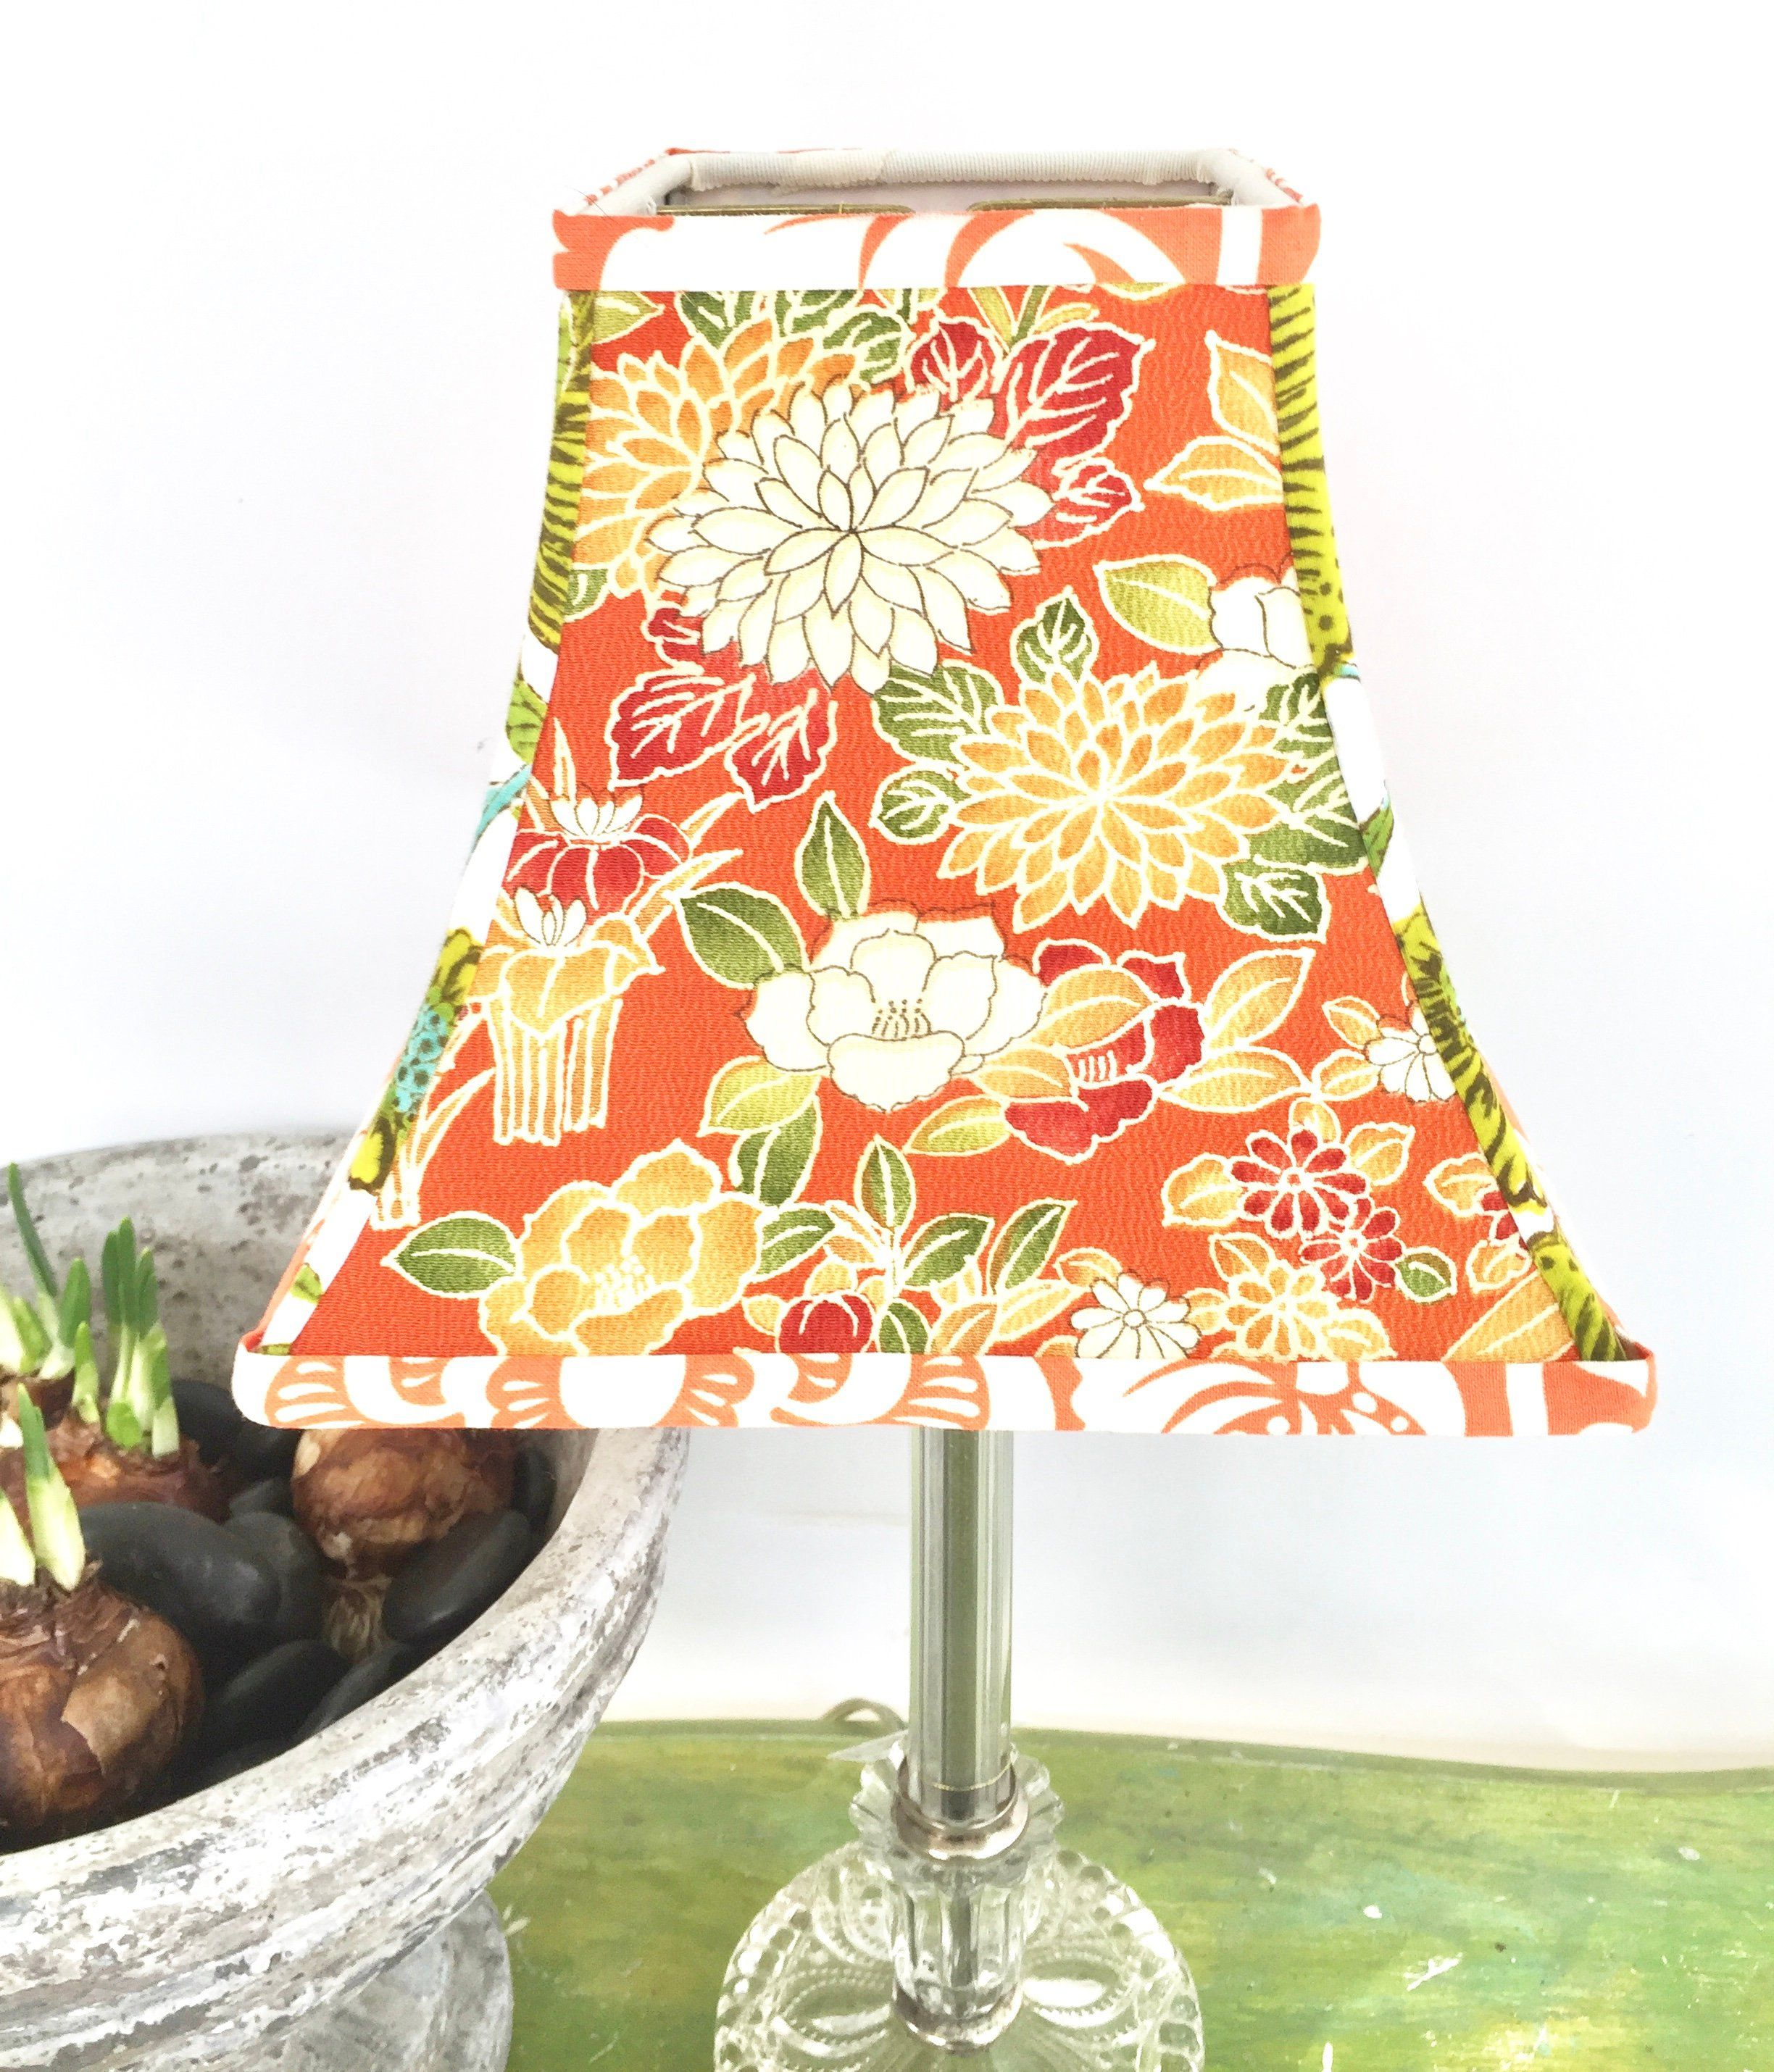 Japanese Funky Lampshade Boho Floral Fabric Lamp Shade Vintage Fun By Lampshadelady On Etsy Lamp Shades Lamp Shade Boho Floral